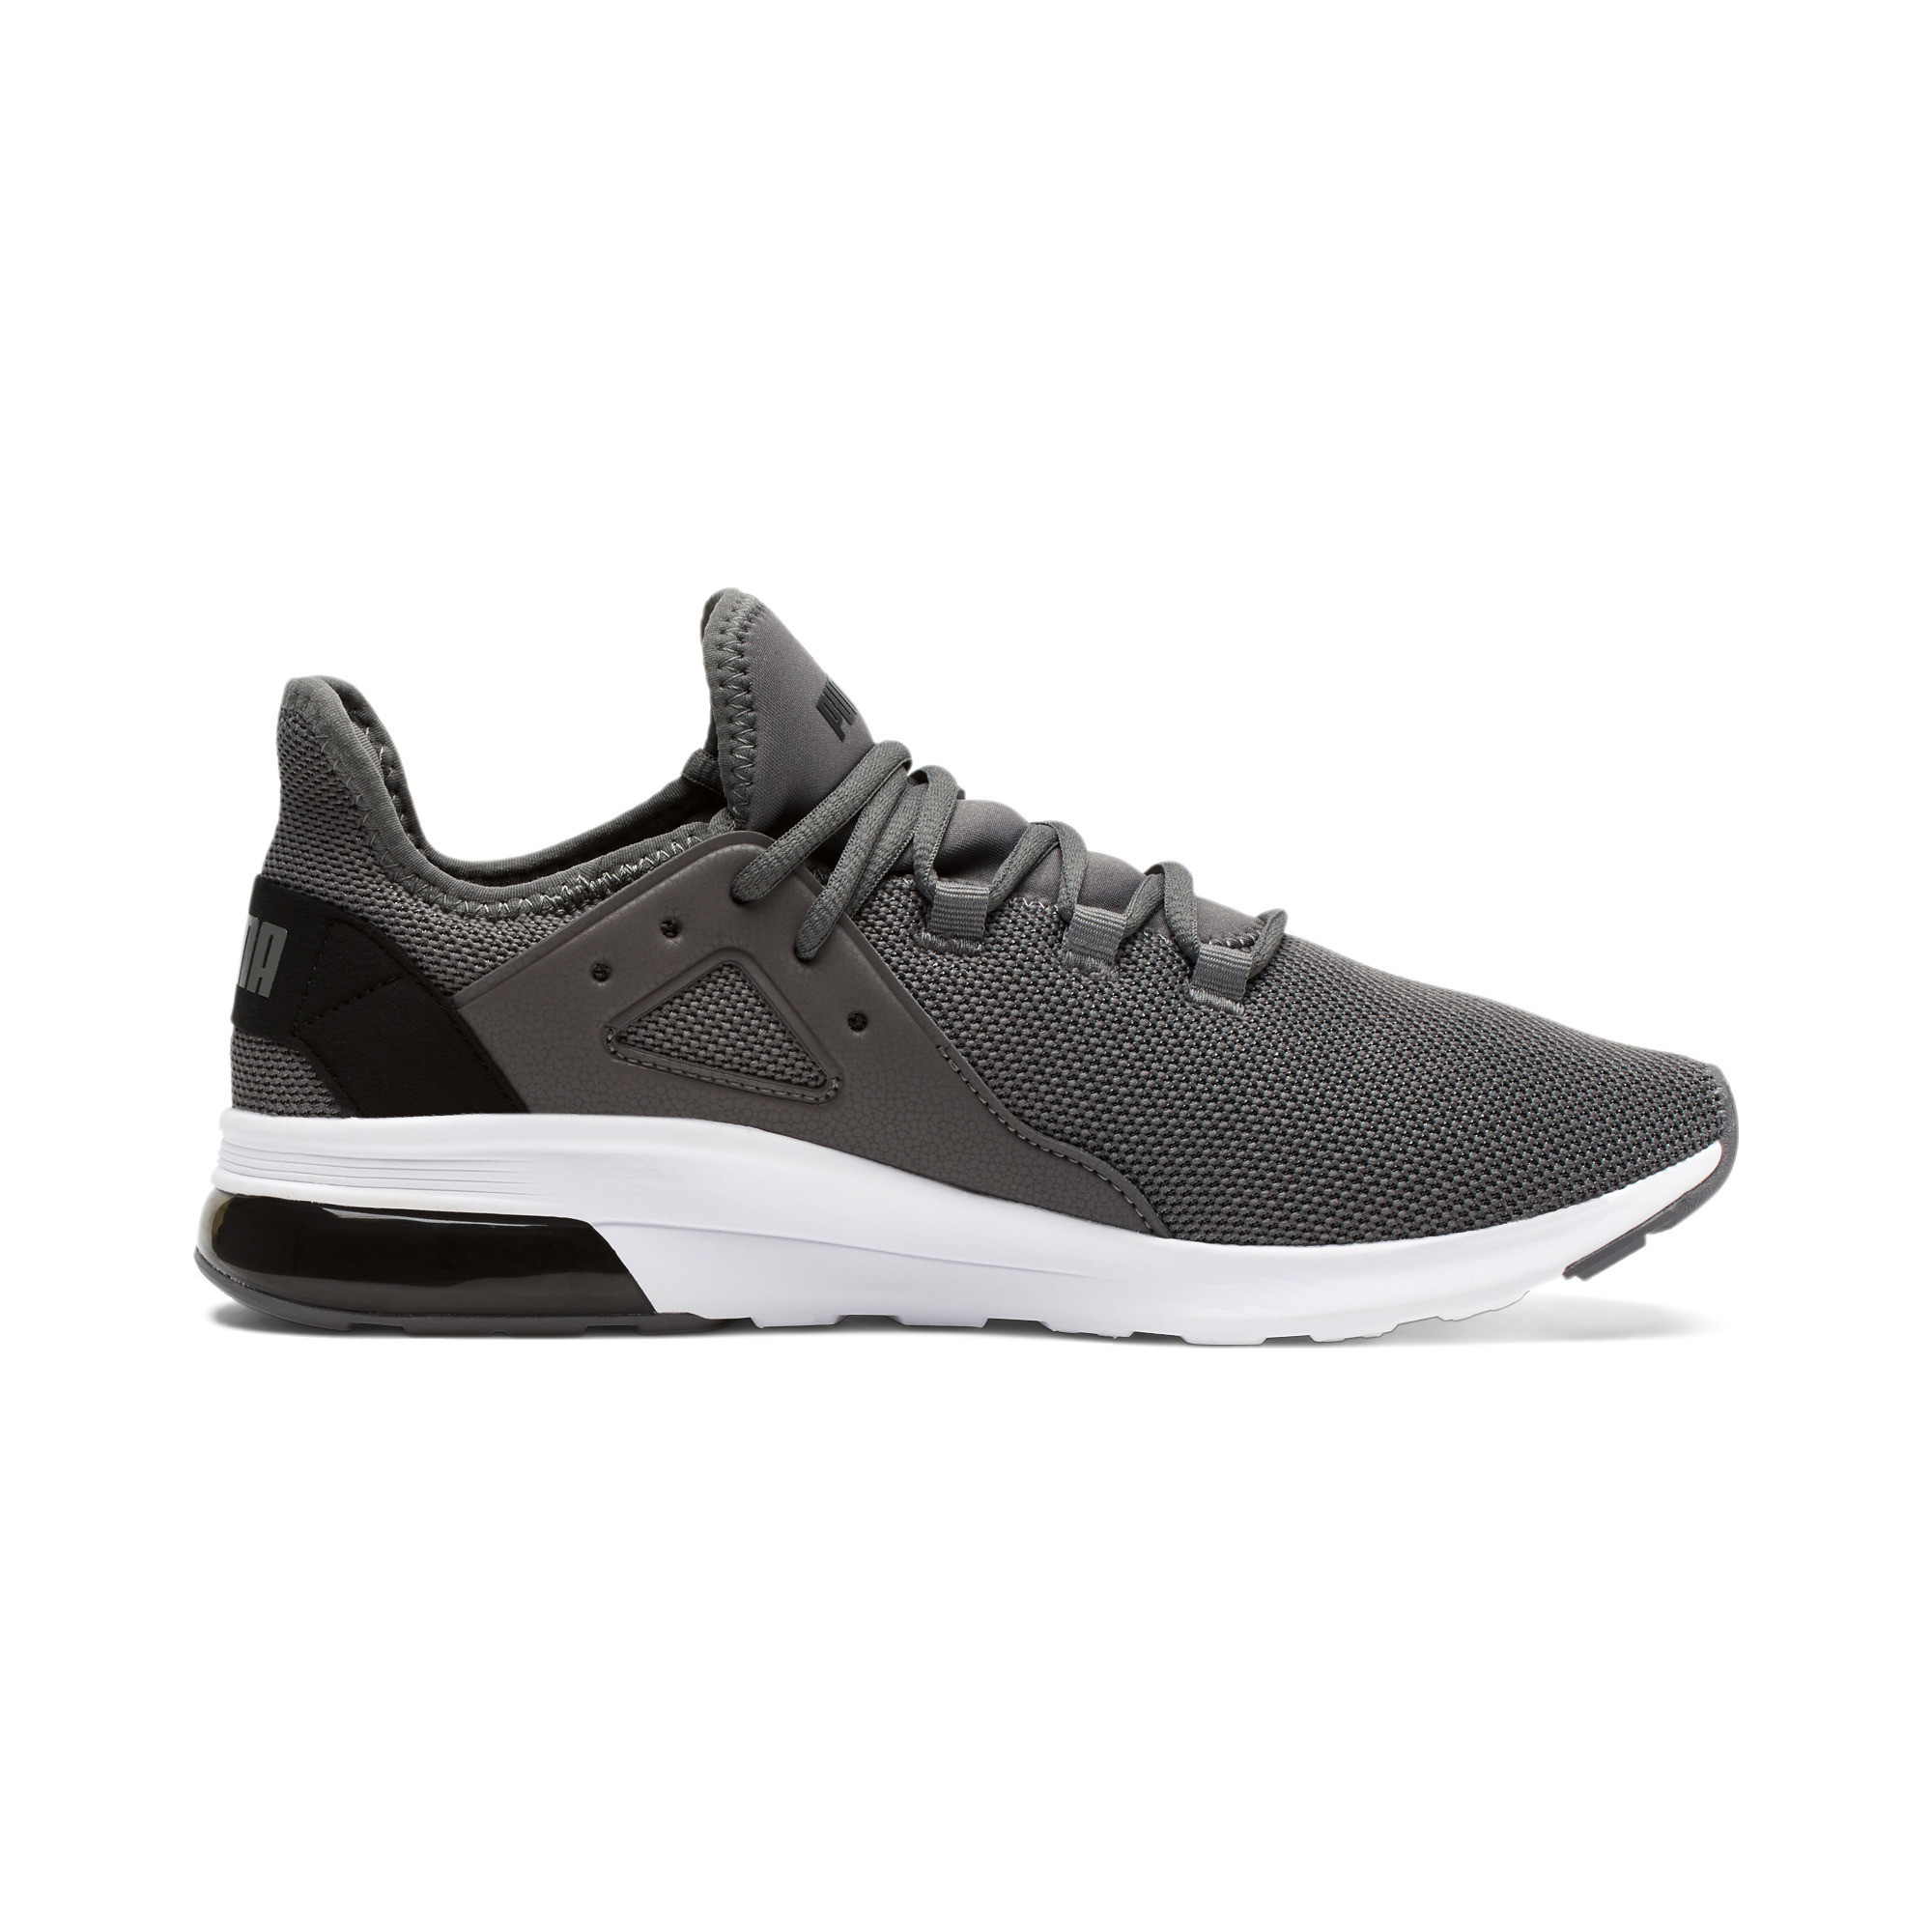 PUMA-Men-039-s-Electron-Street-Sneakers thumbnail 16